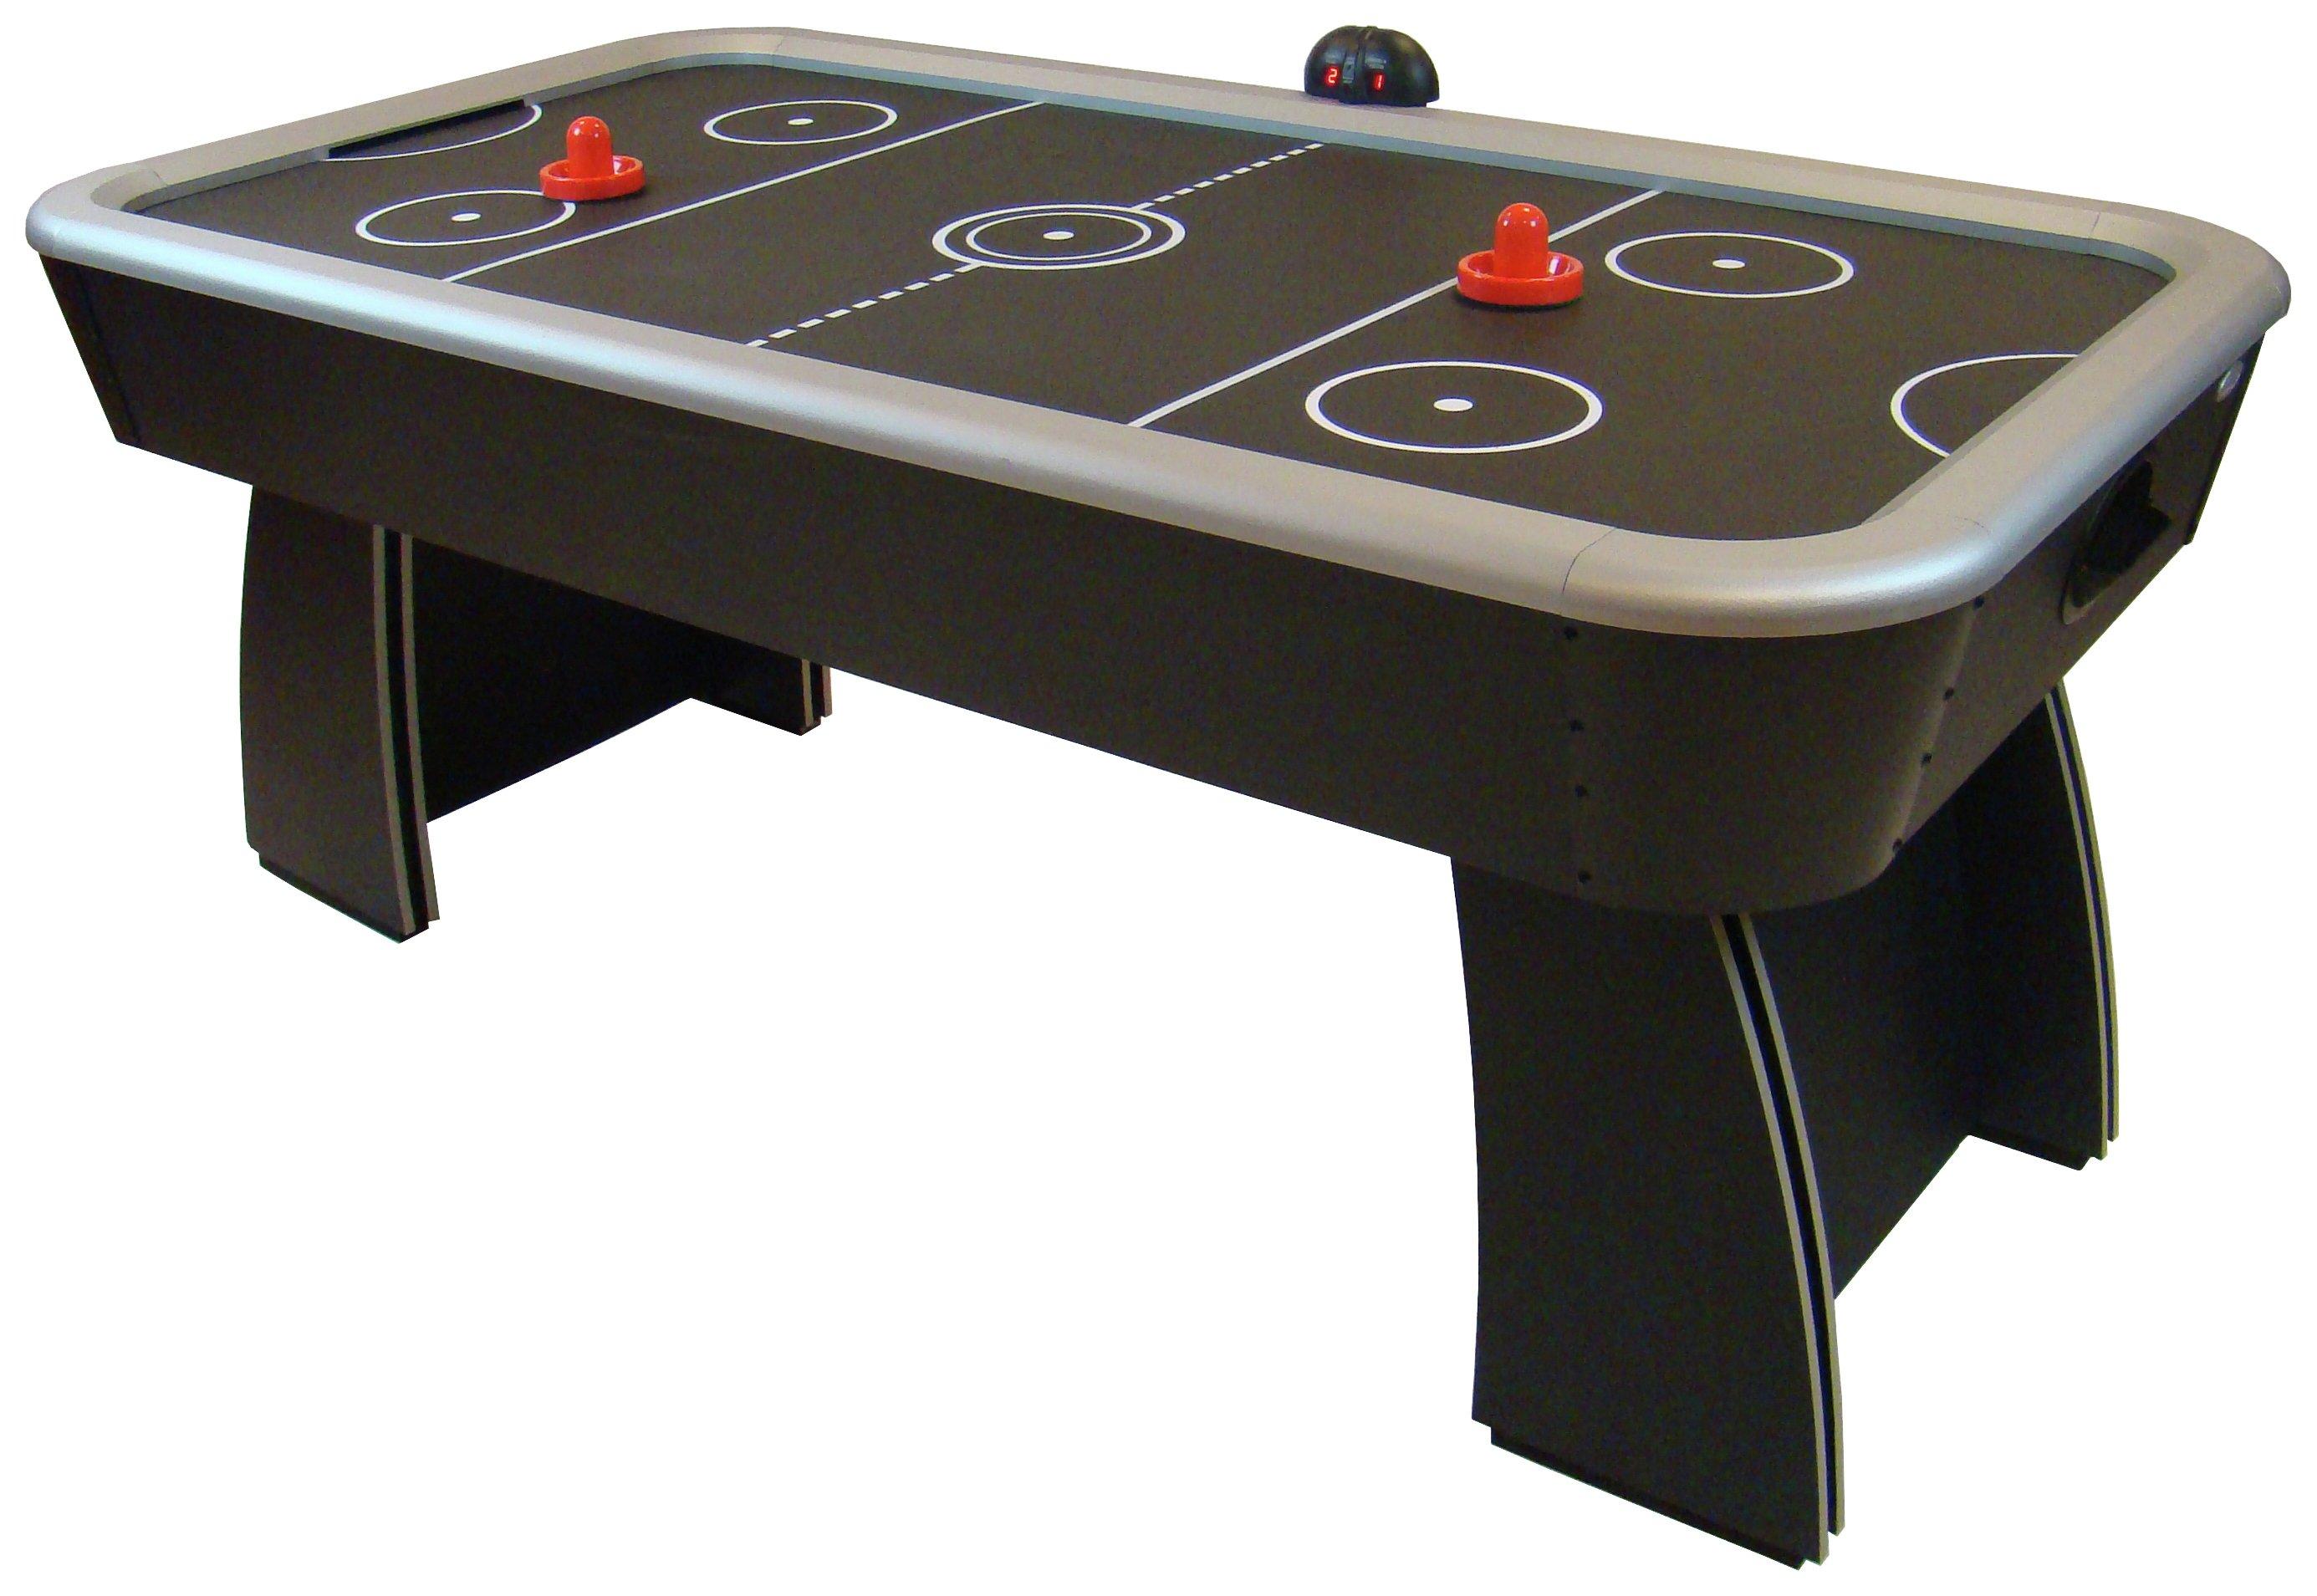 Gamesson 6ft Spectrum Air Hockey Table (Black)